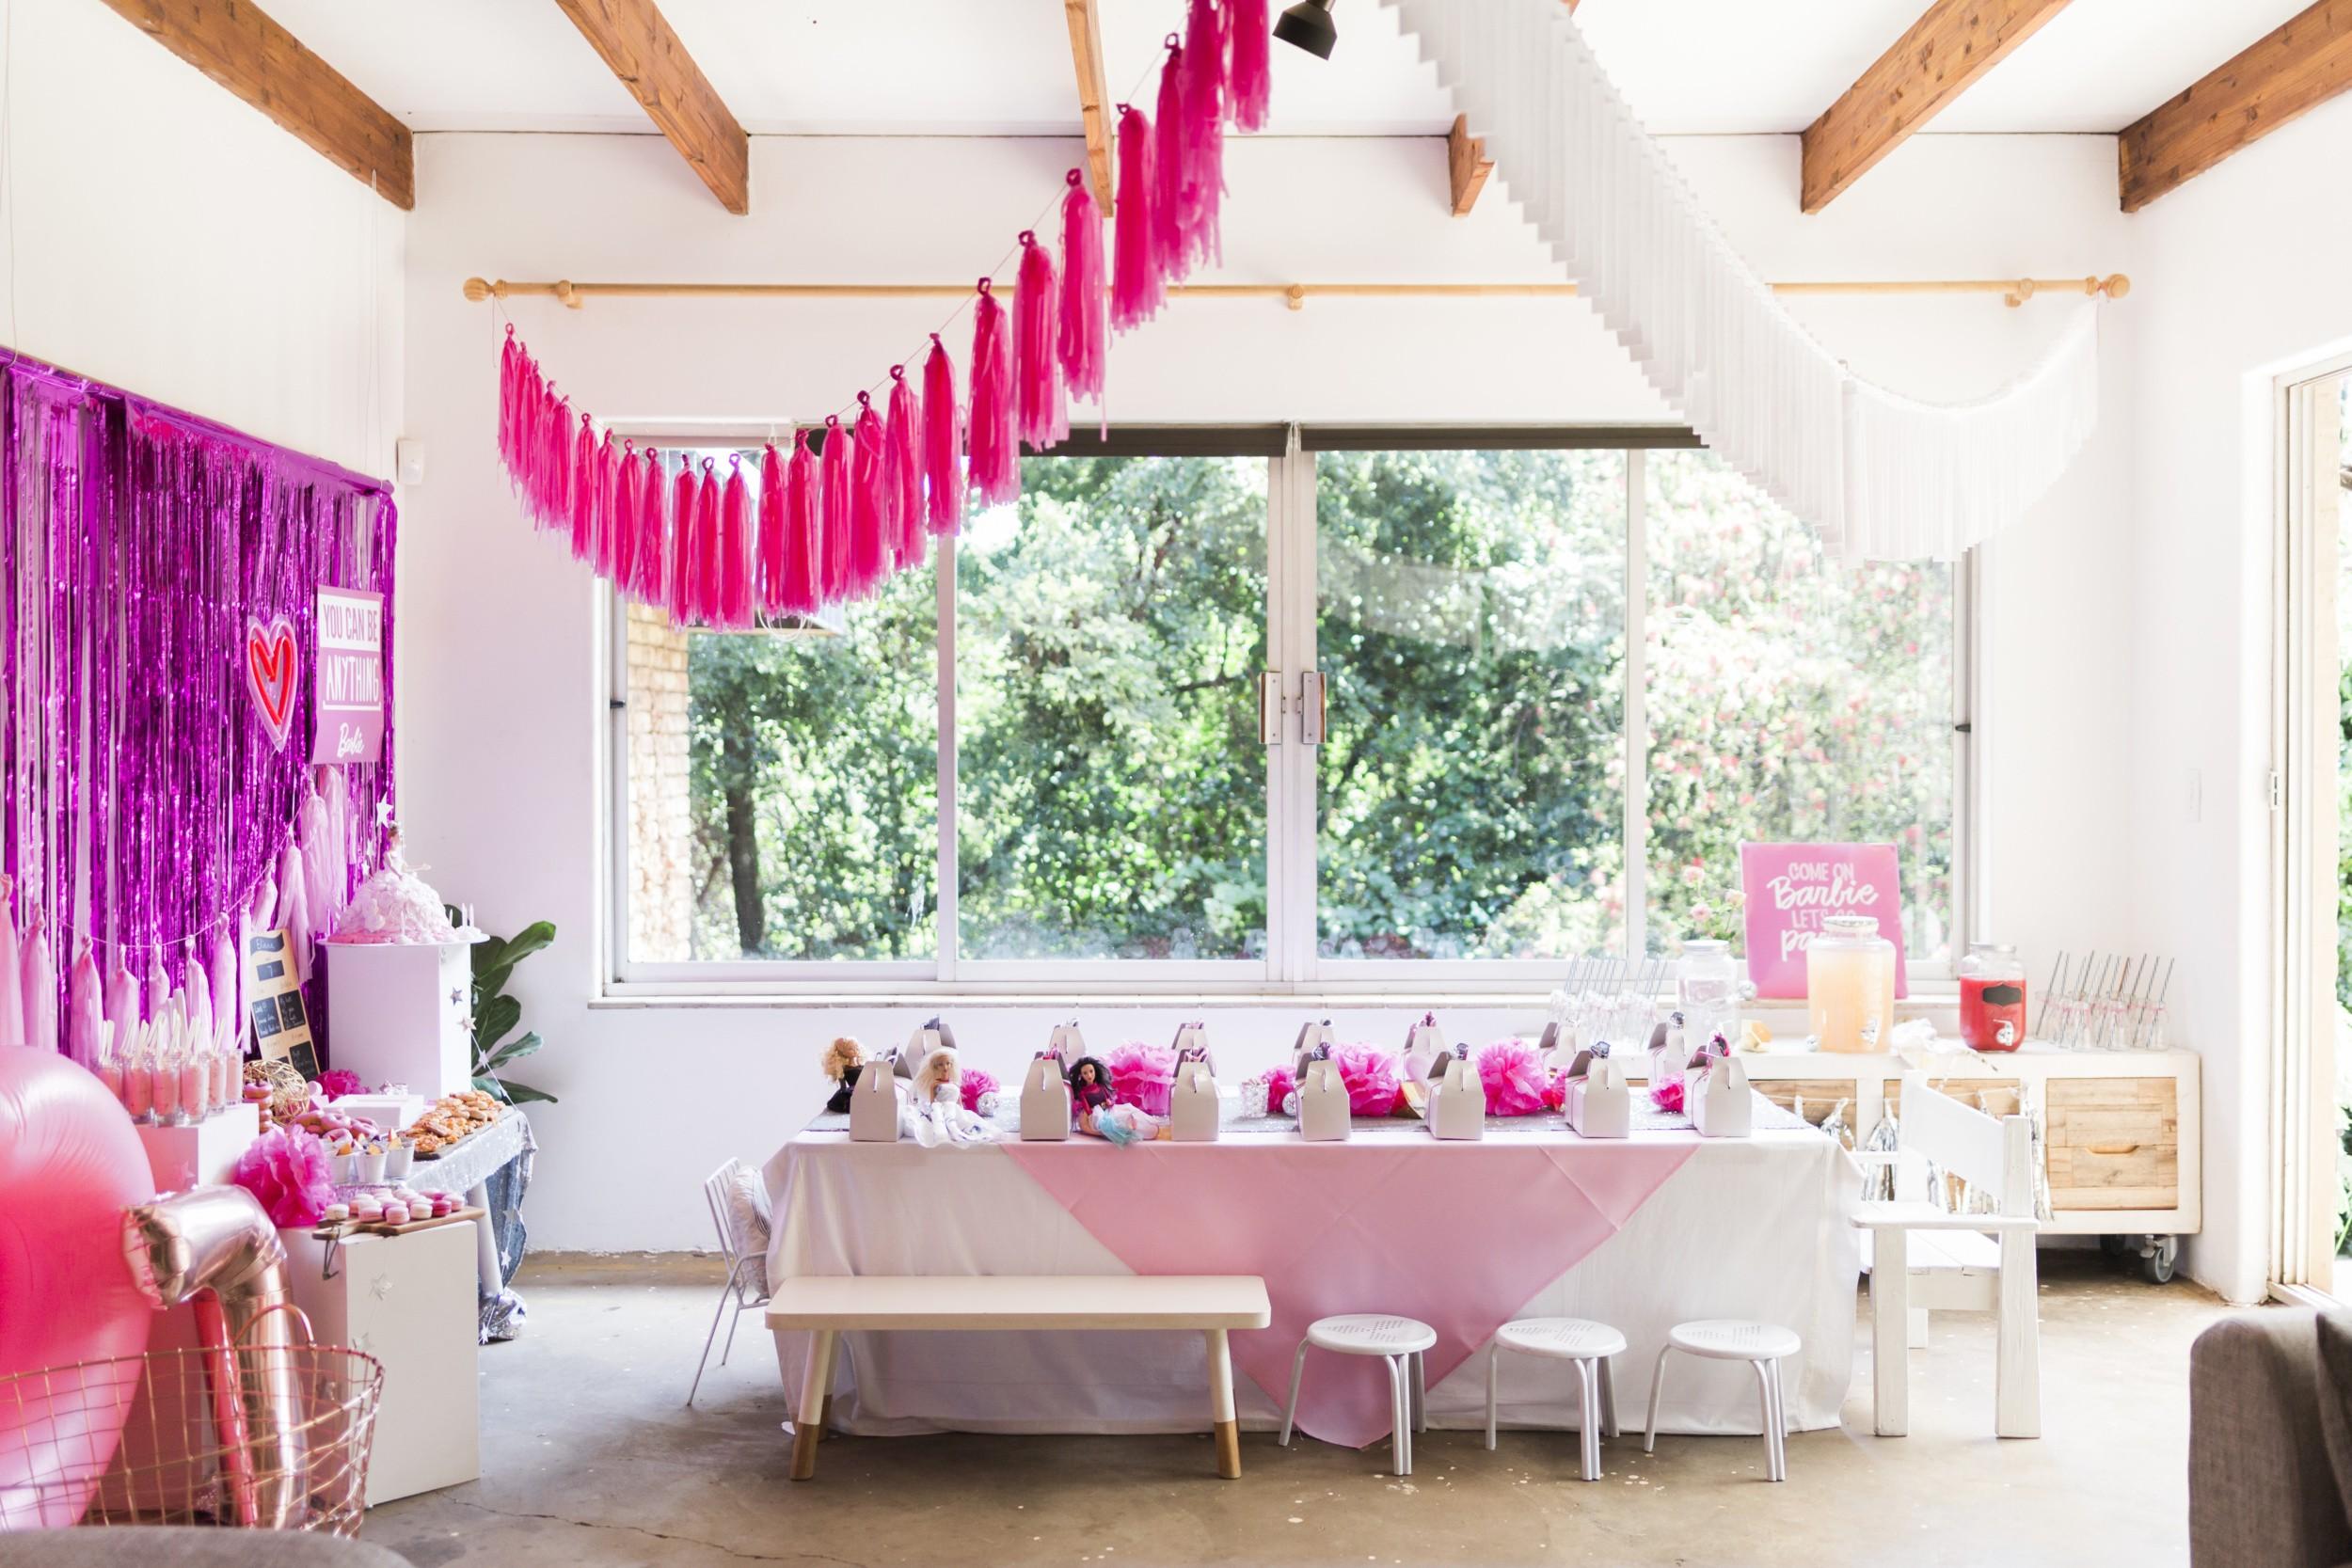 Diy Barbie Birthday Party